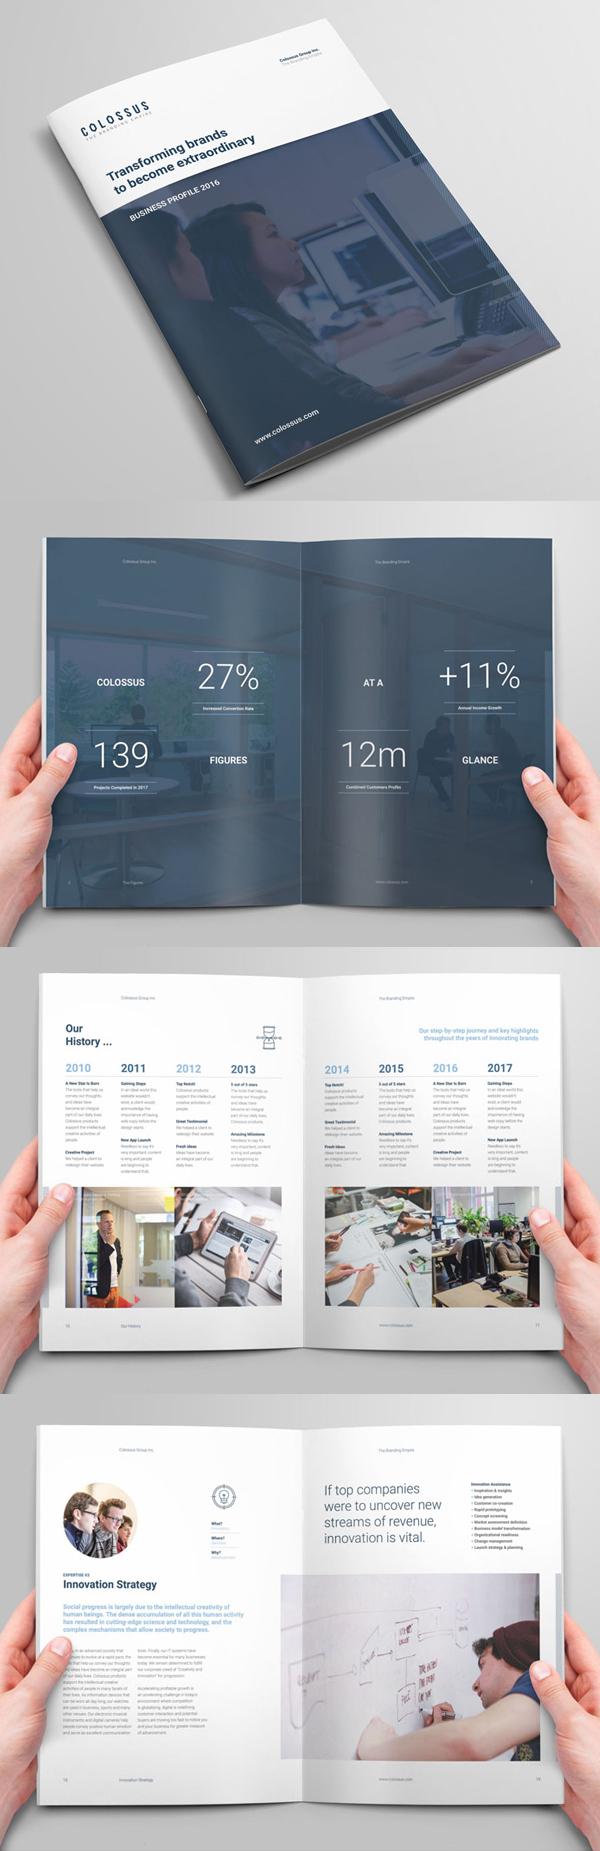 100 Professional Corporate Brochure Templates - 16